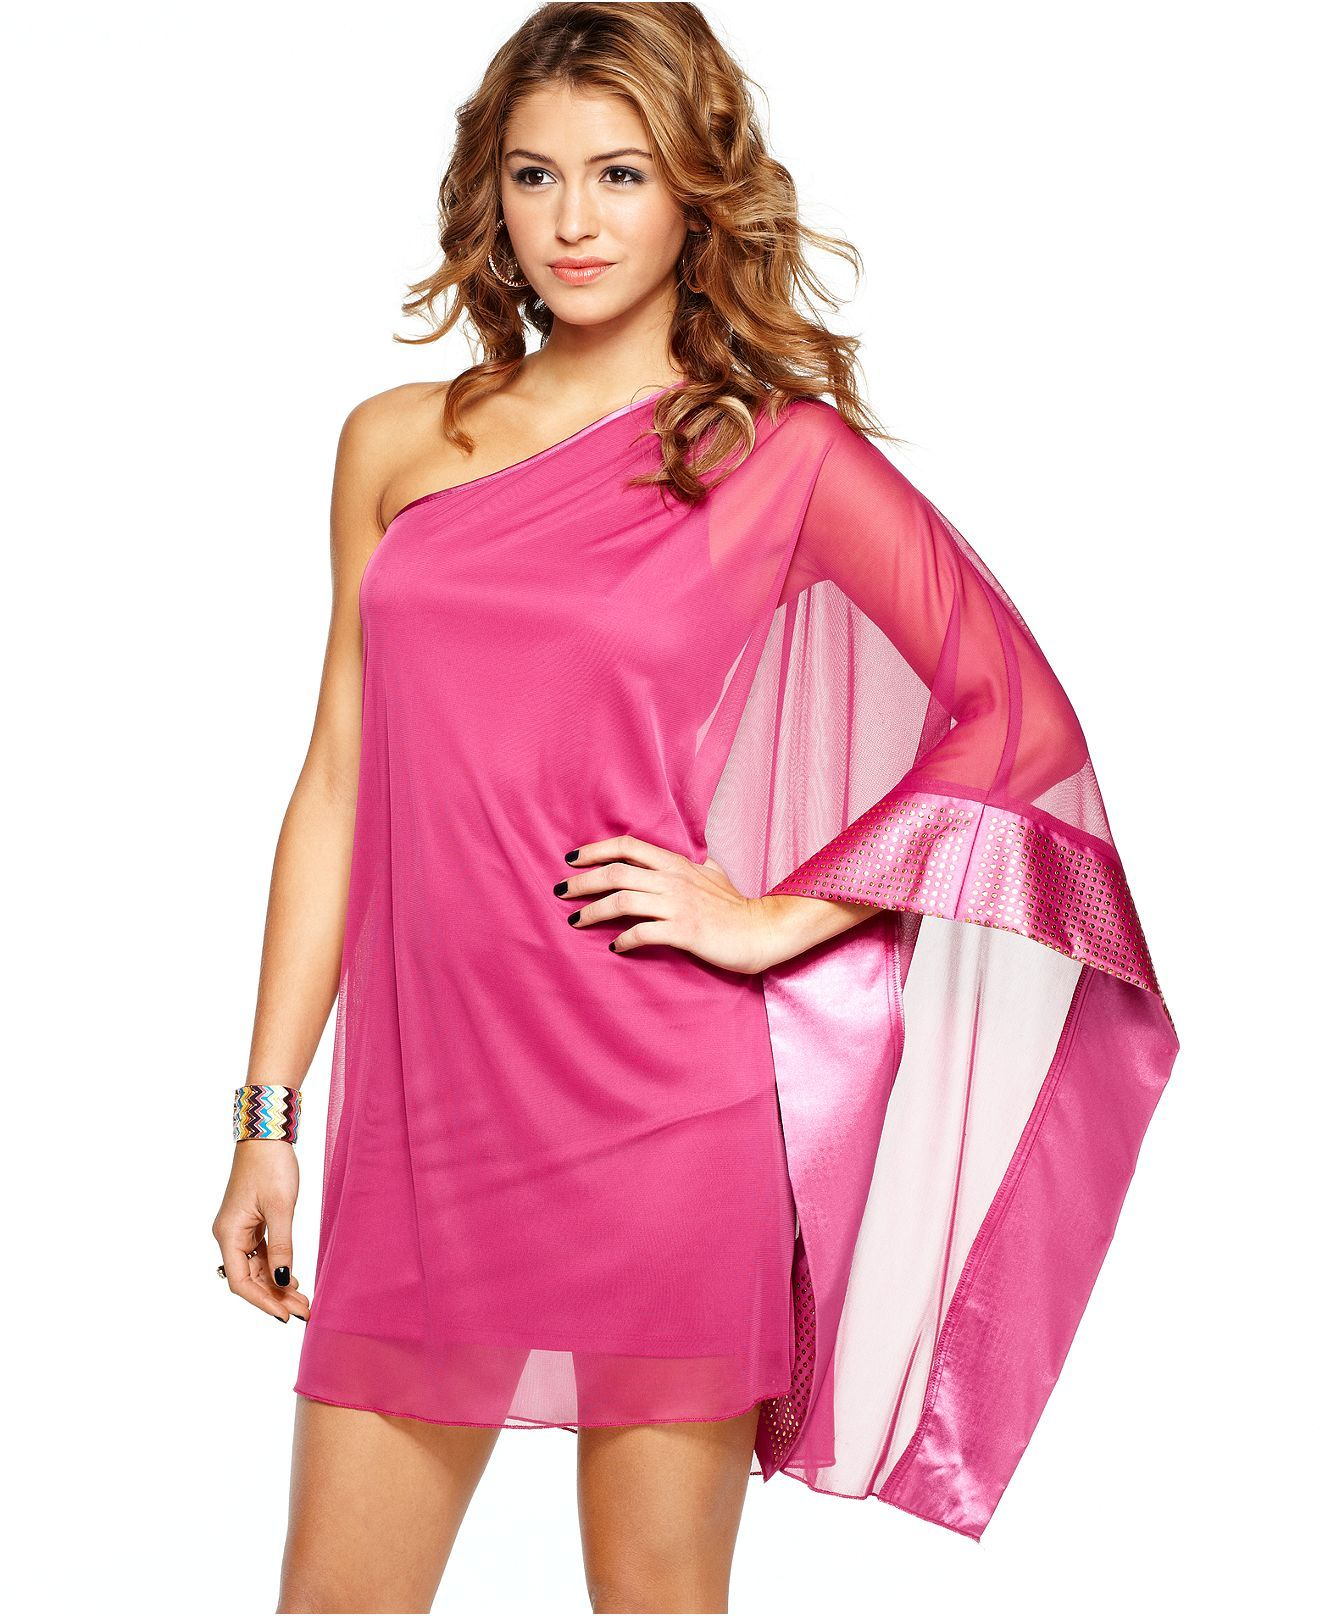 Ruby Rox Dress, Long Batwing Sleeve Studded Chiffon One Shoulder ...